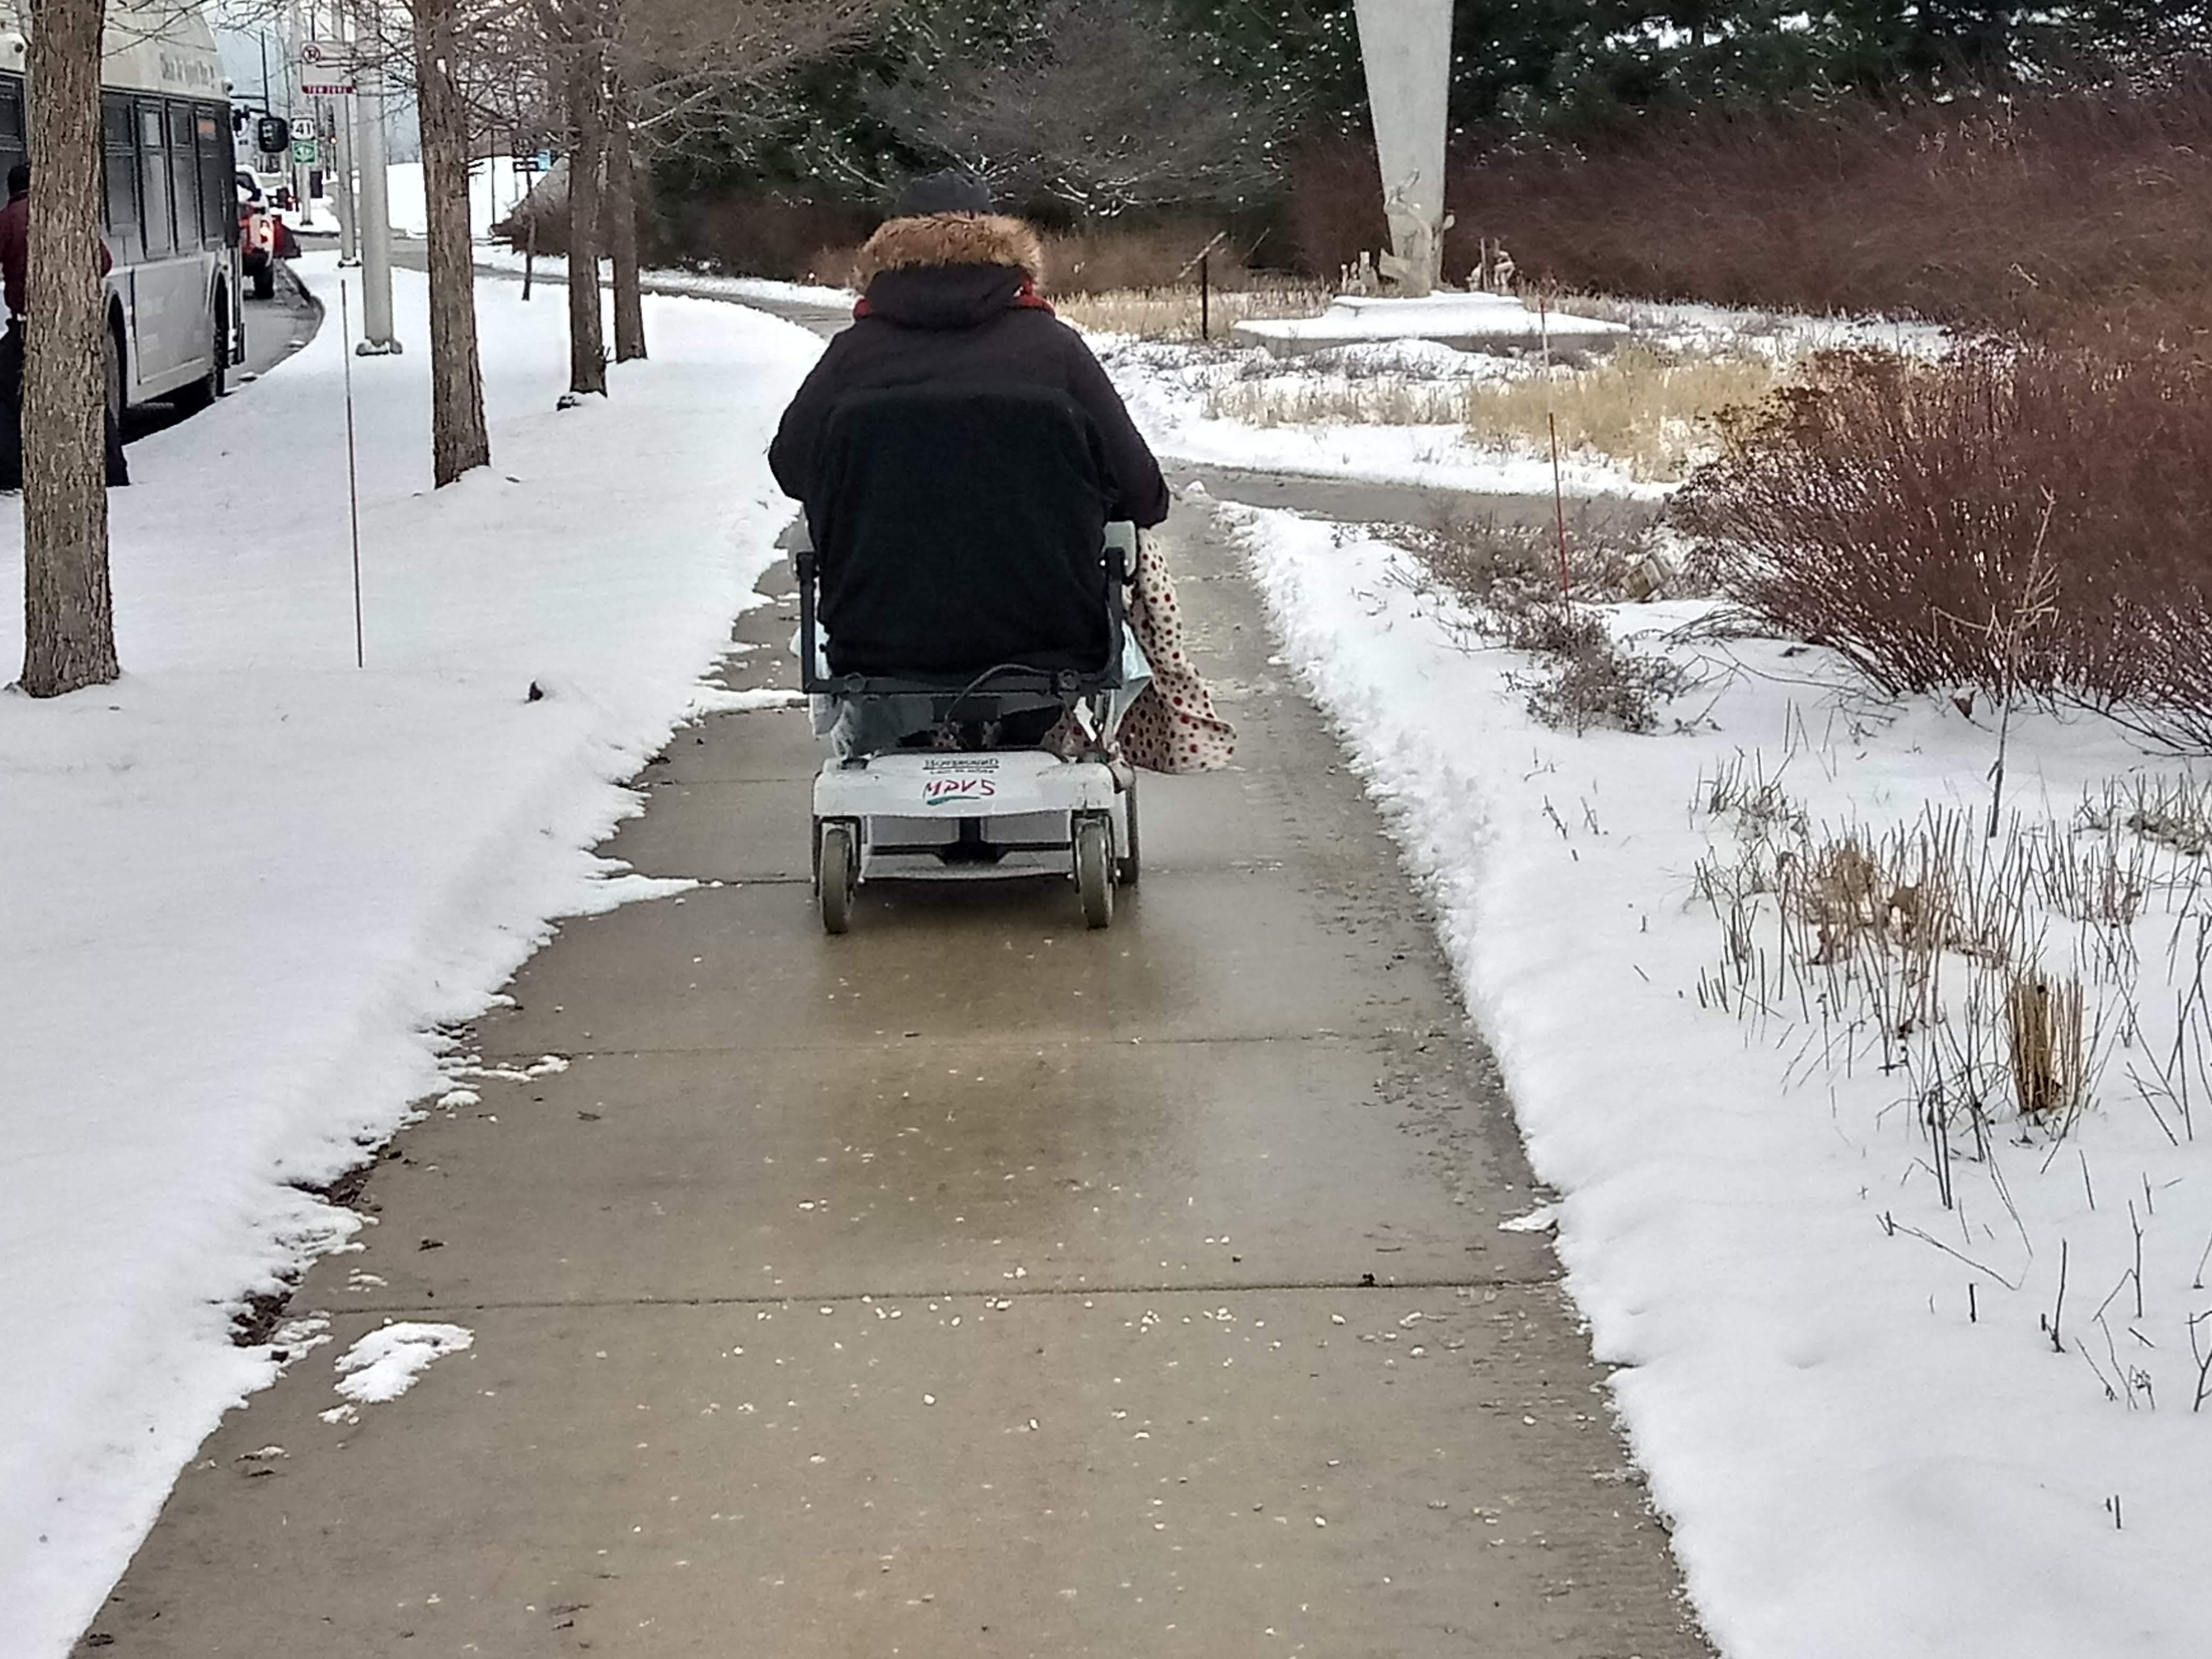 Sidewalk Snow Cleaning